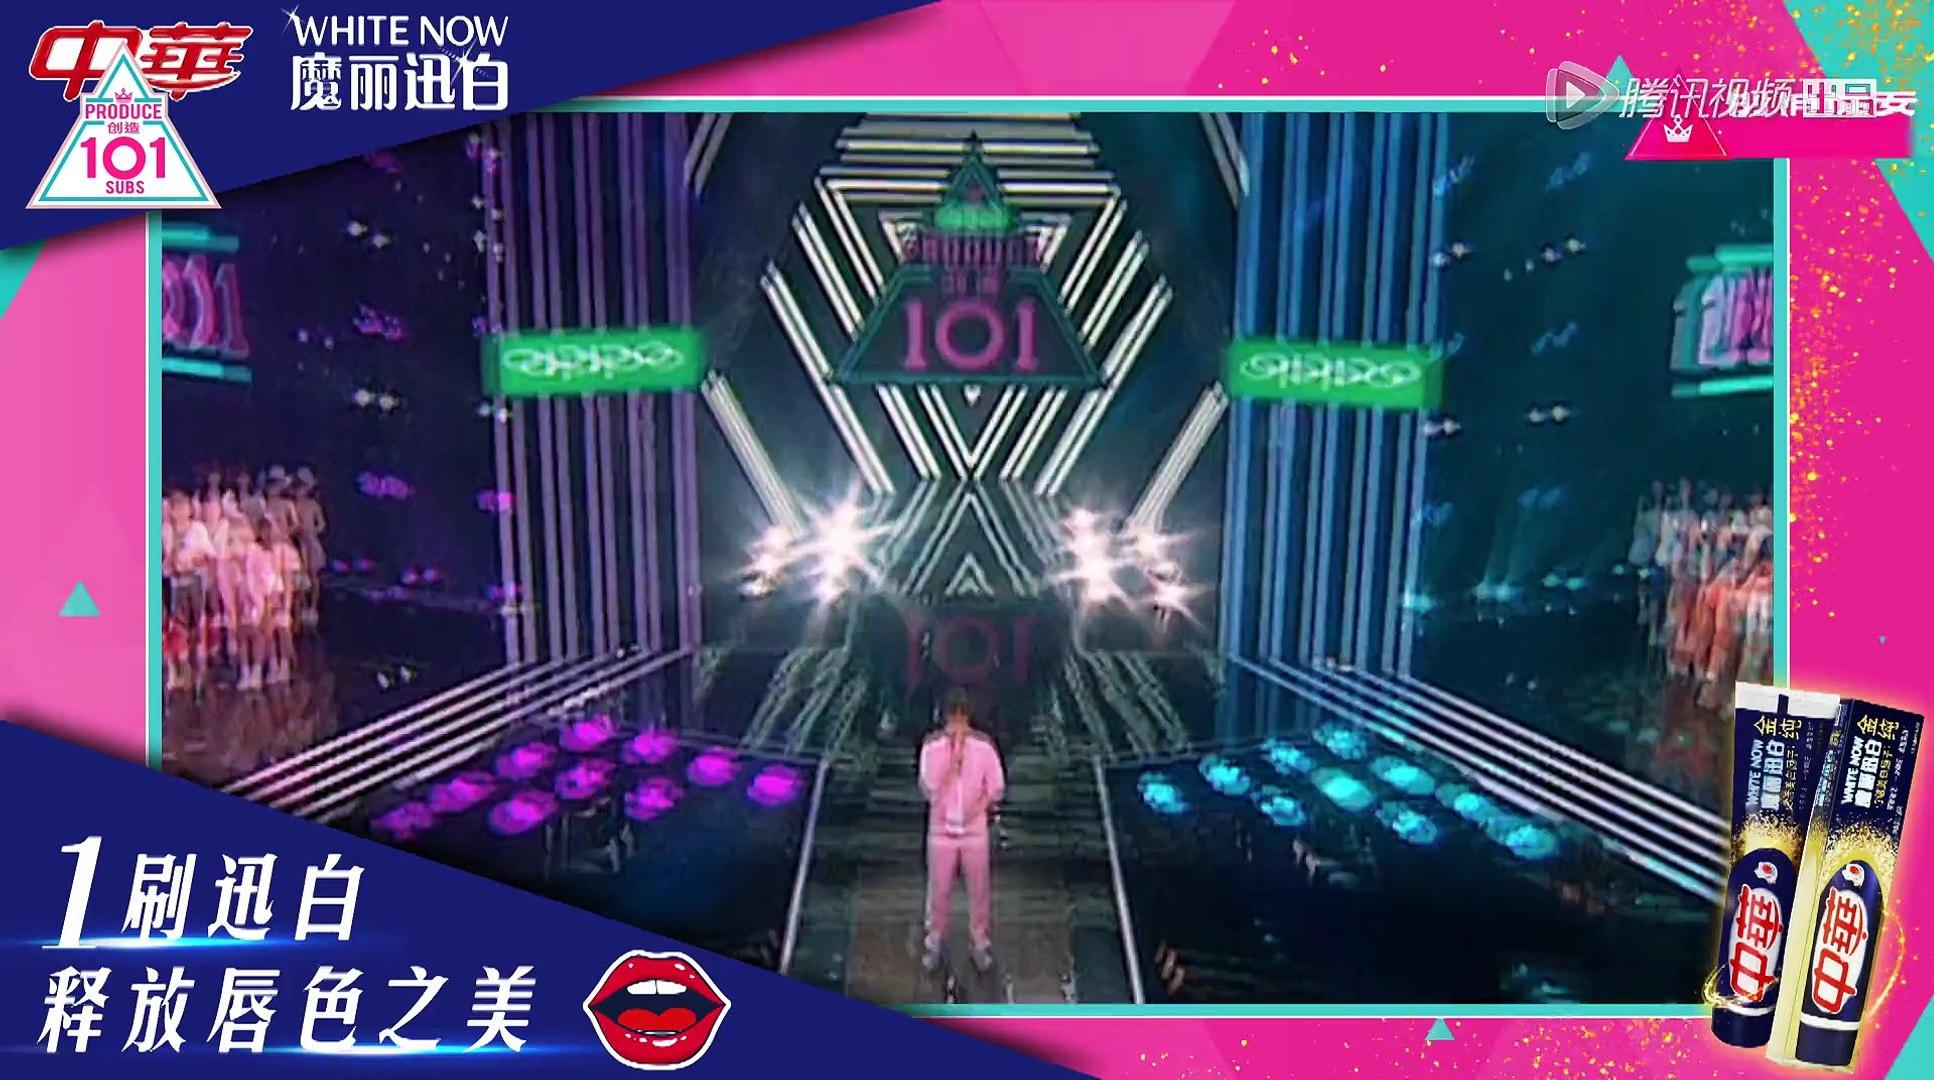 [ENG SUBS] Produce 101 China Episode 4 [PART 1/3]